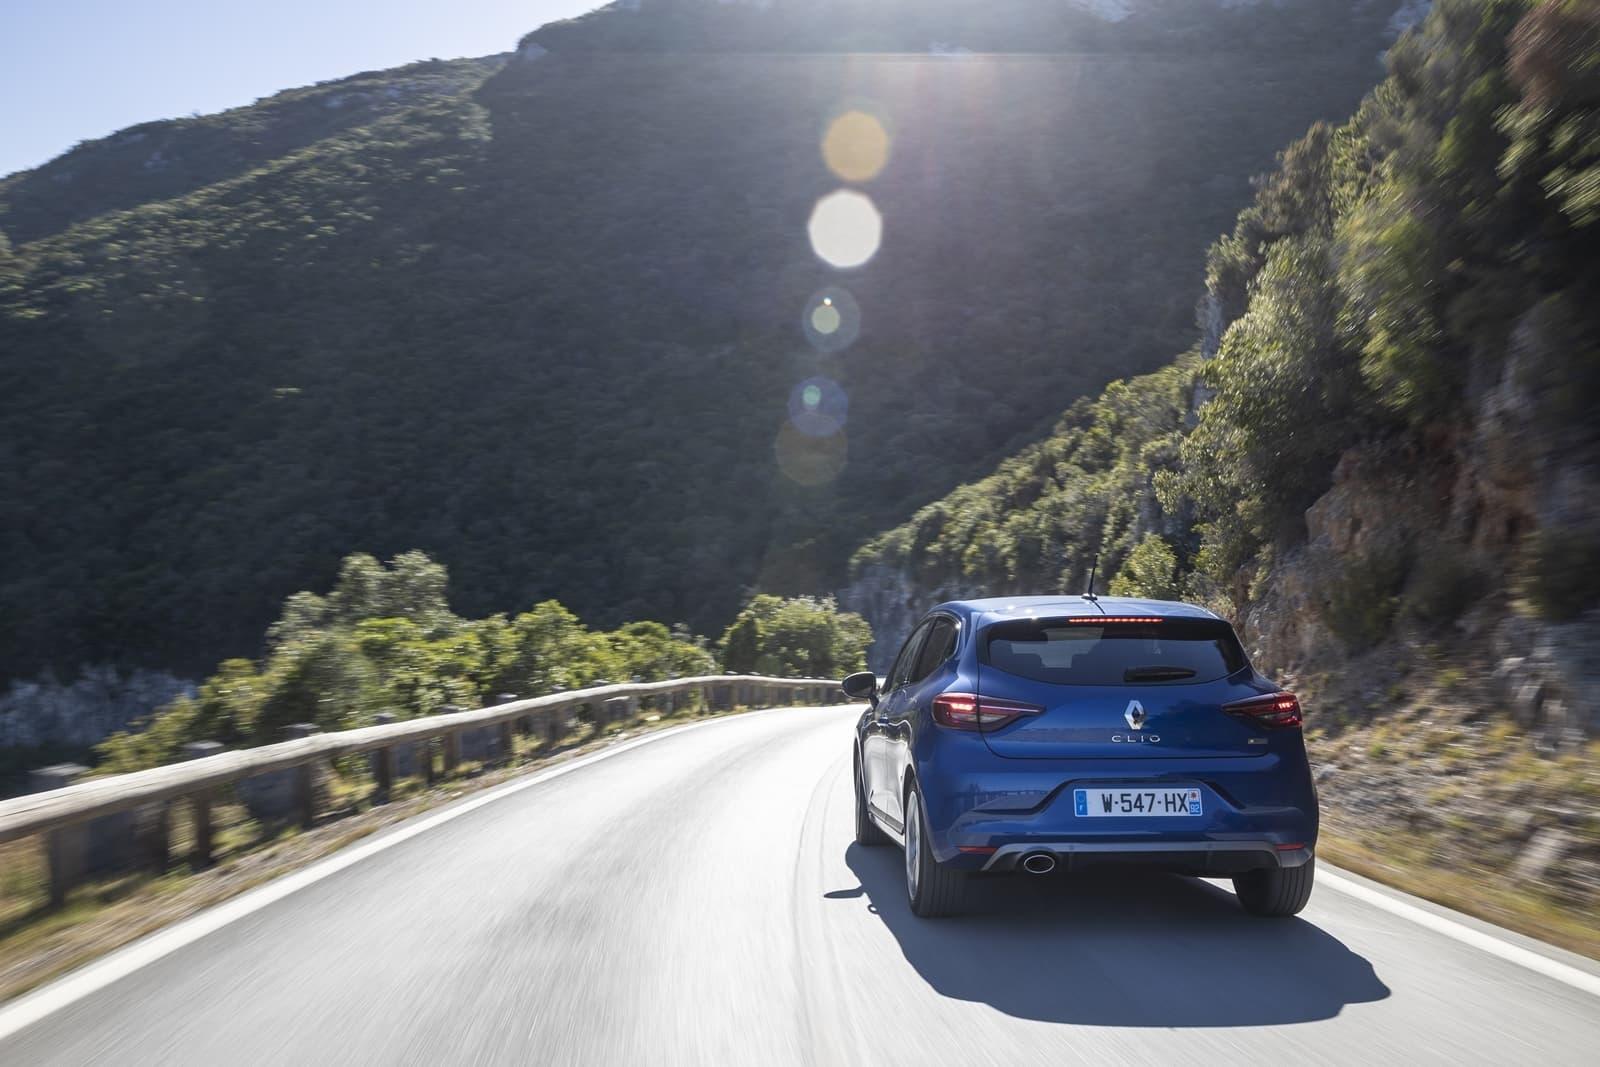 Renault Clio 2020 Prueba 0619 030